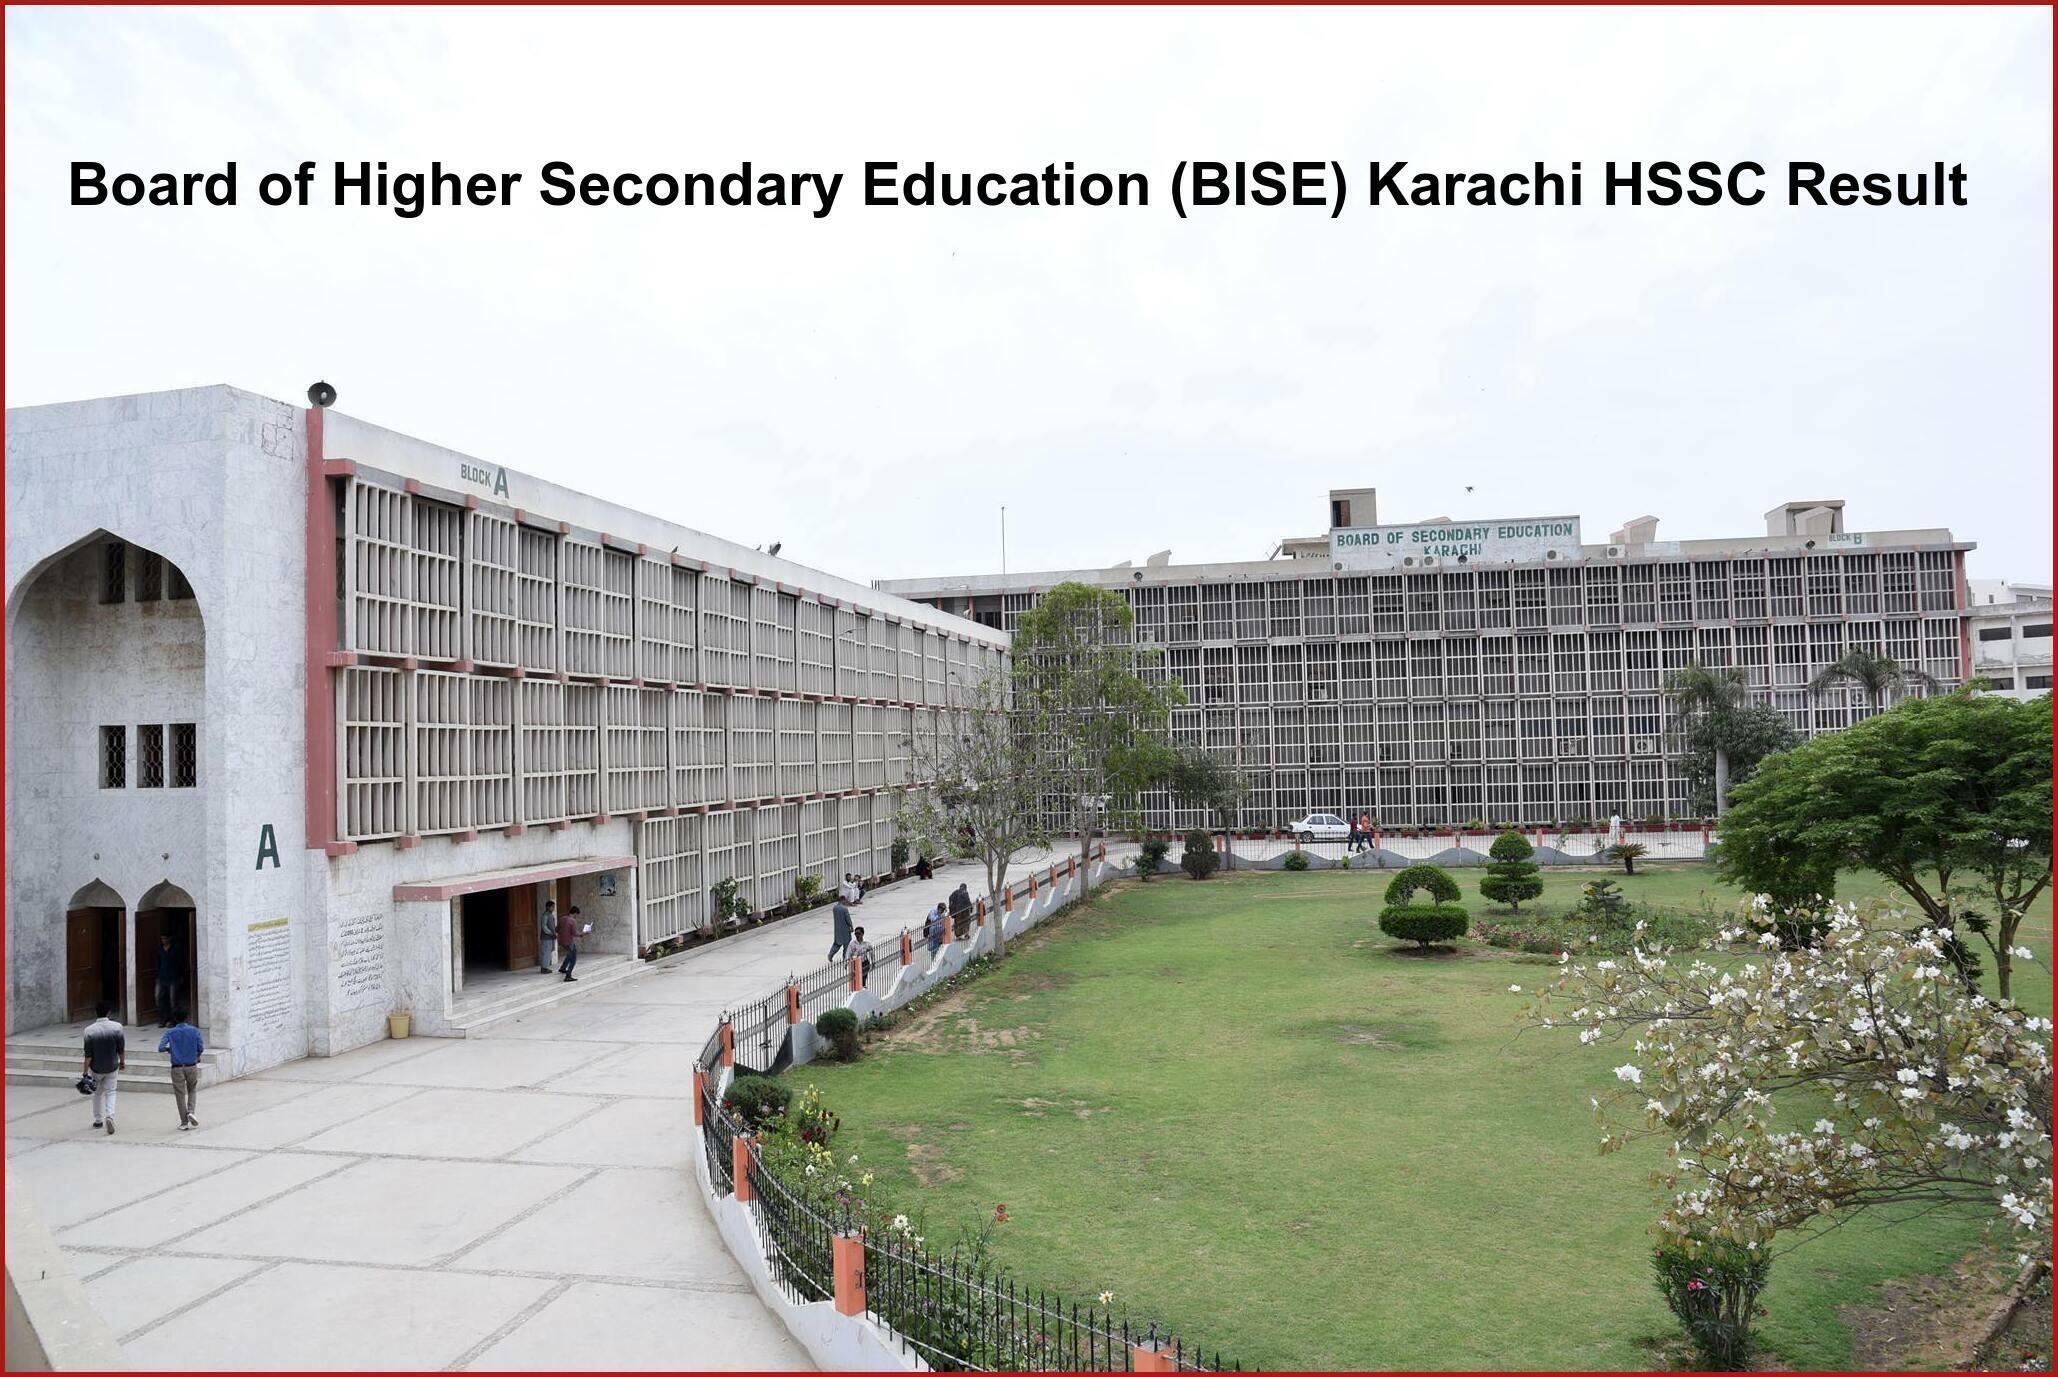 Board of Higher Secondary Education (BISE) Karachi HSSC Result